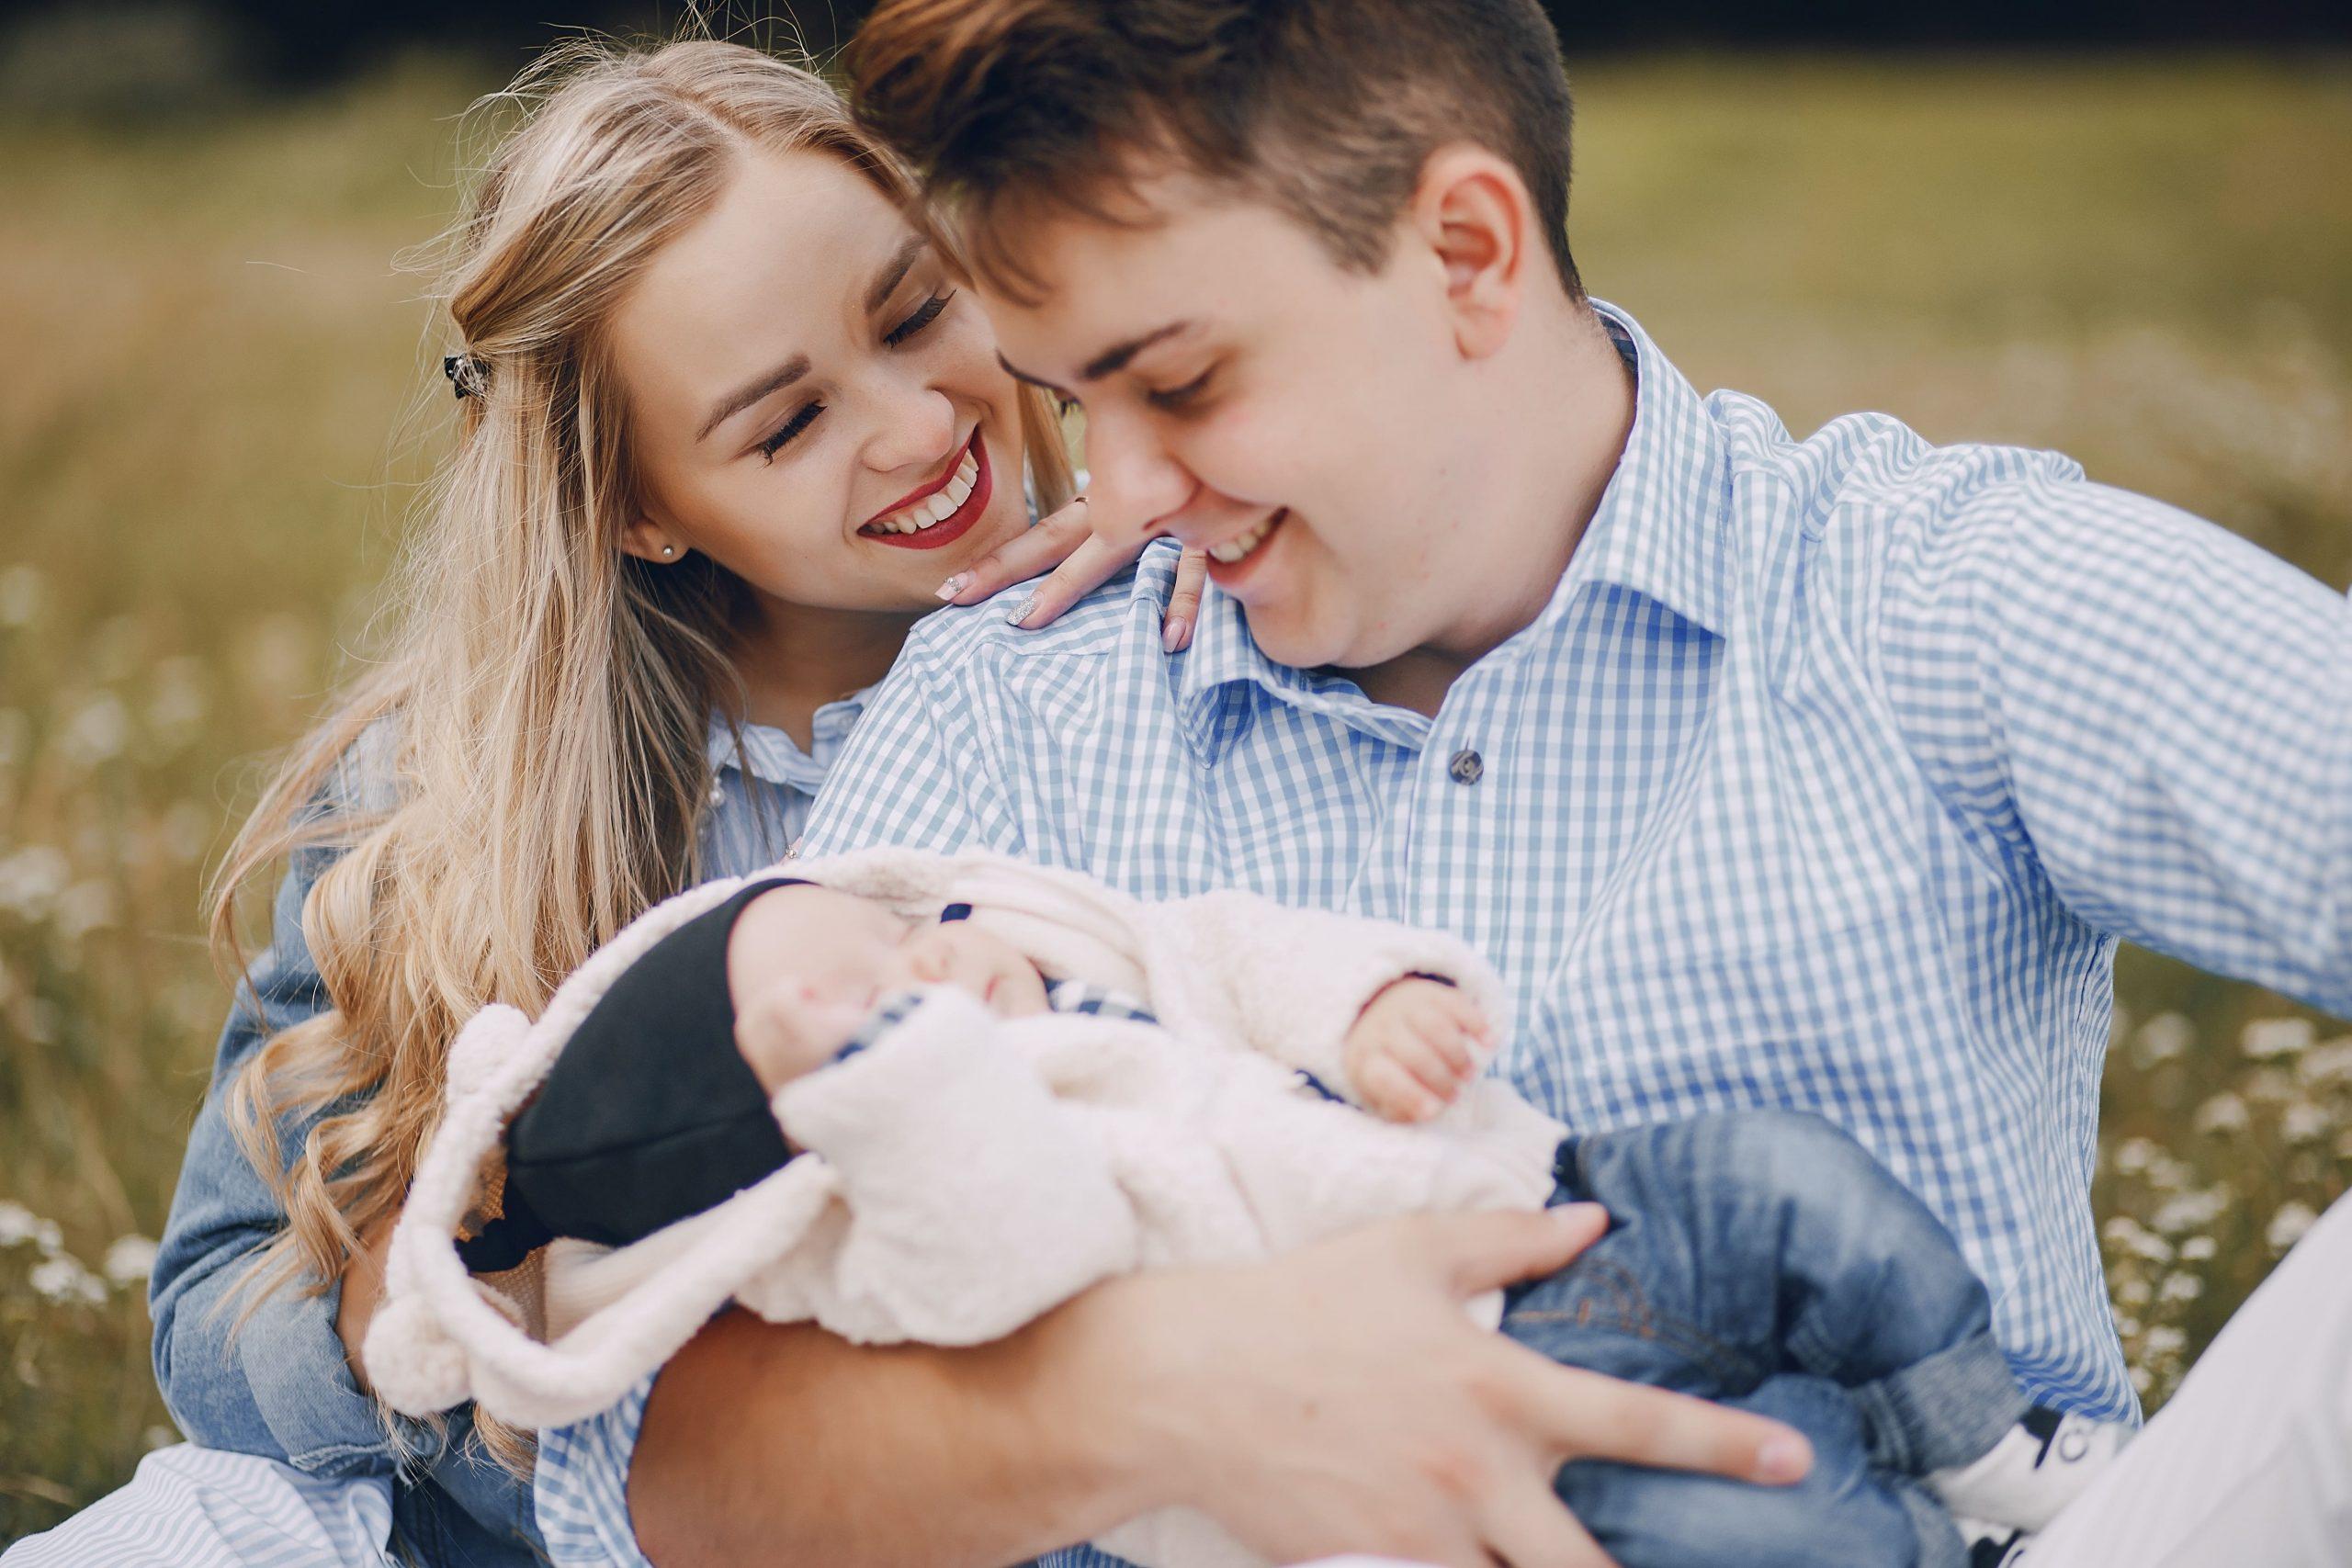 family-with-newborns-PL7X8HJ